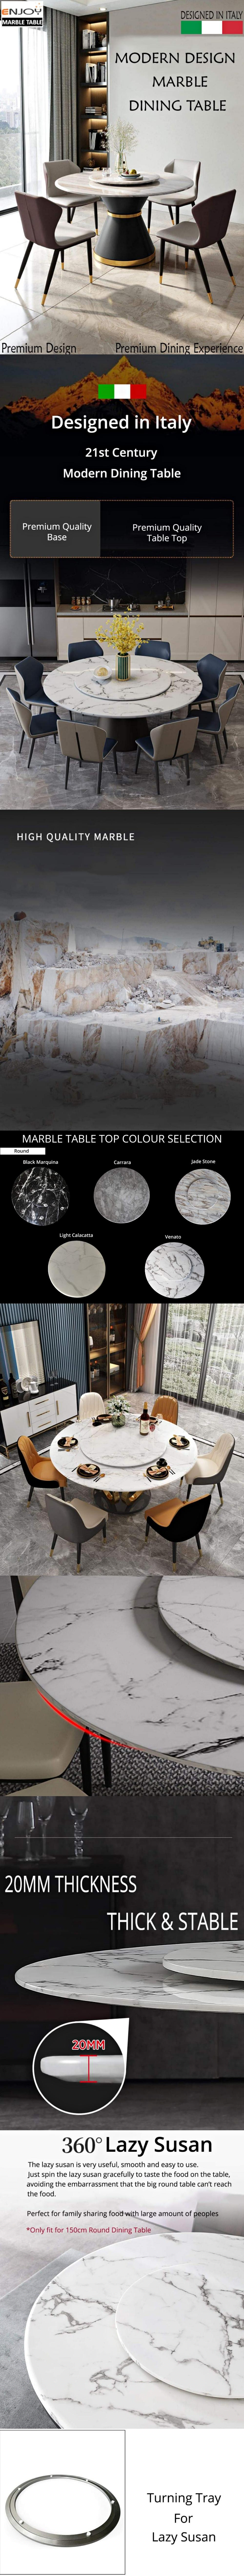 Round-Speaker-Base-Dining-Table-Item-Description-1